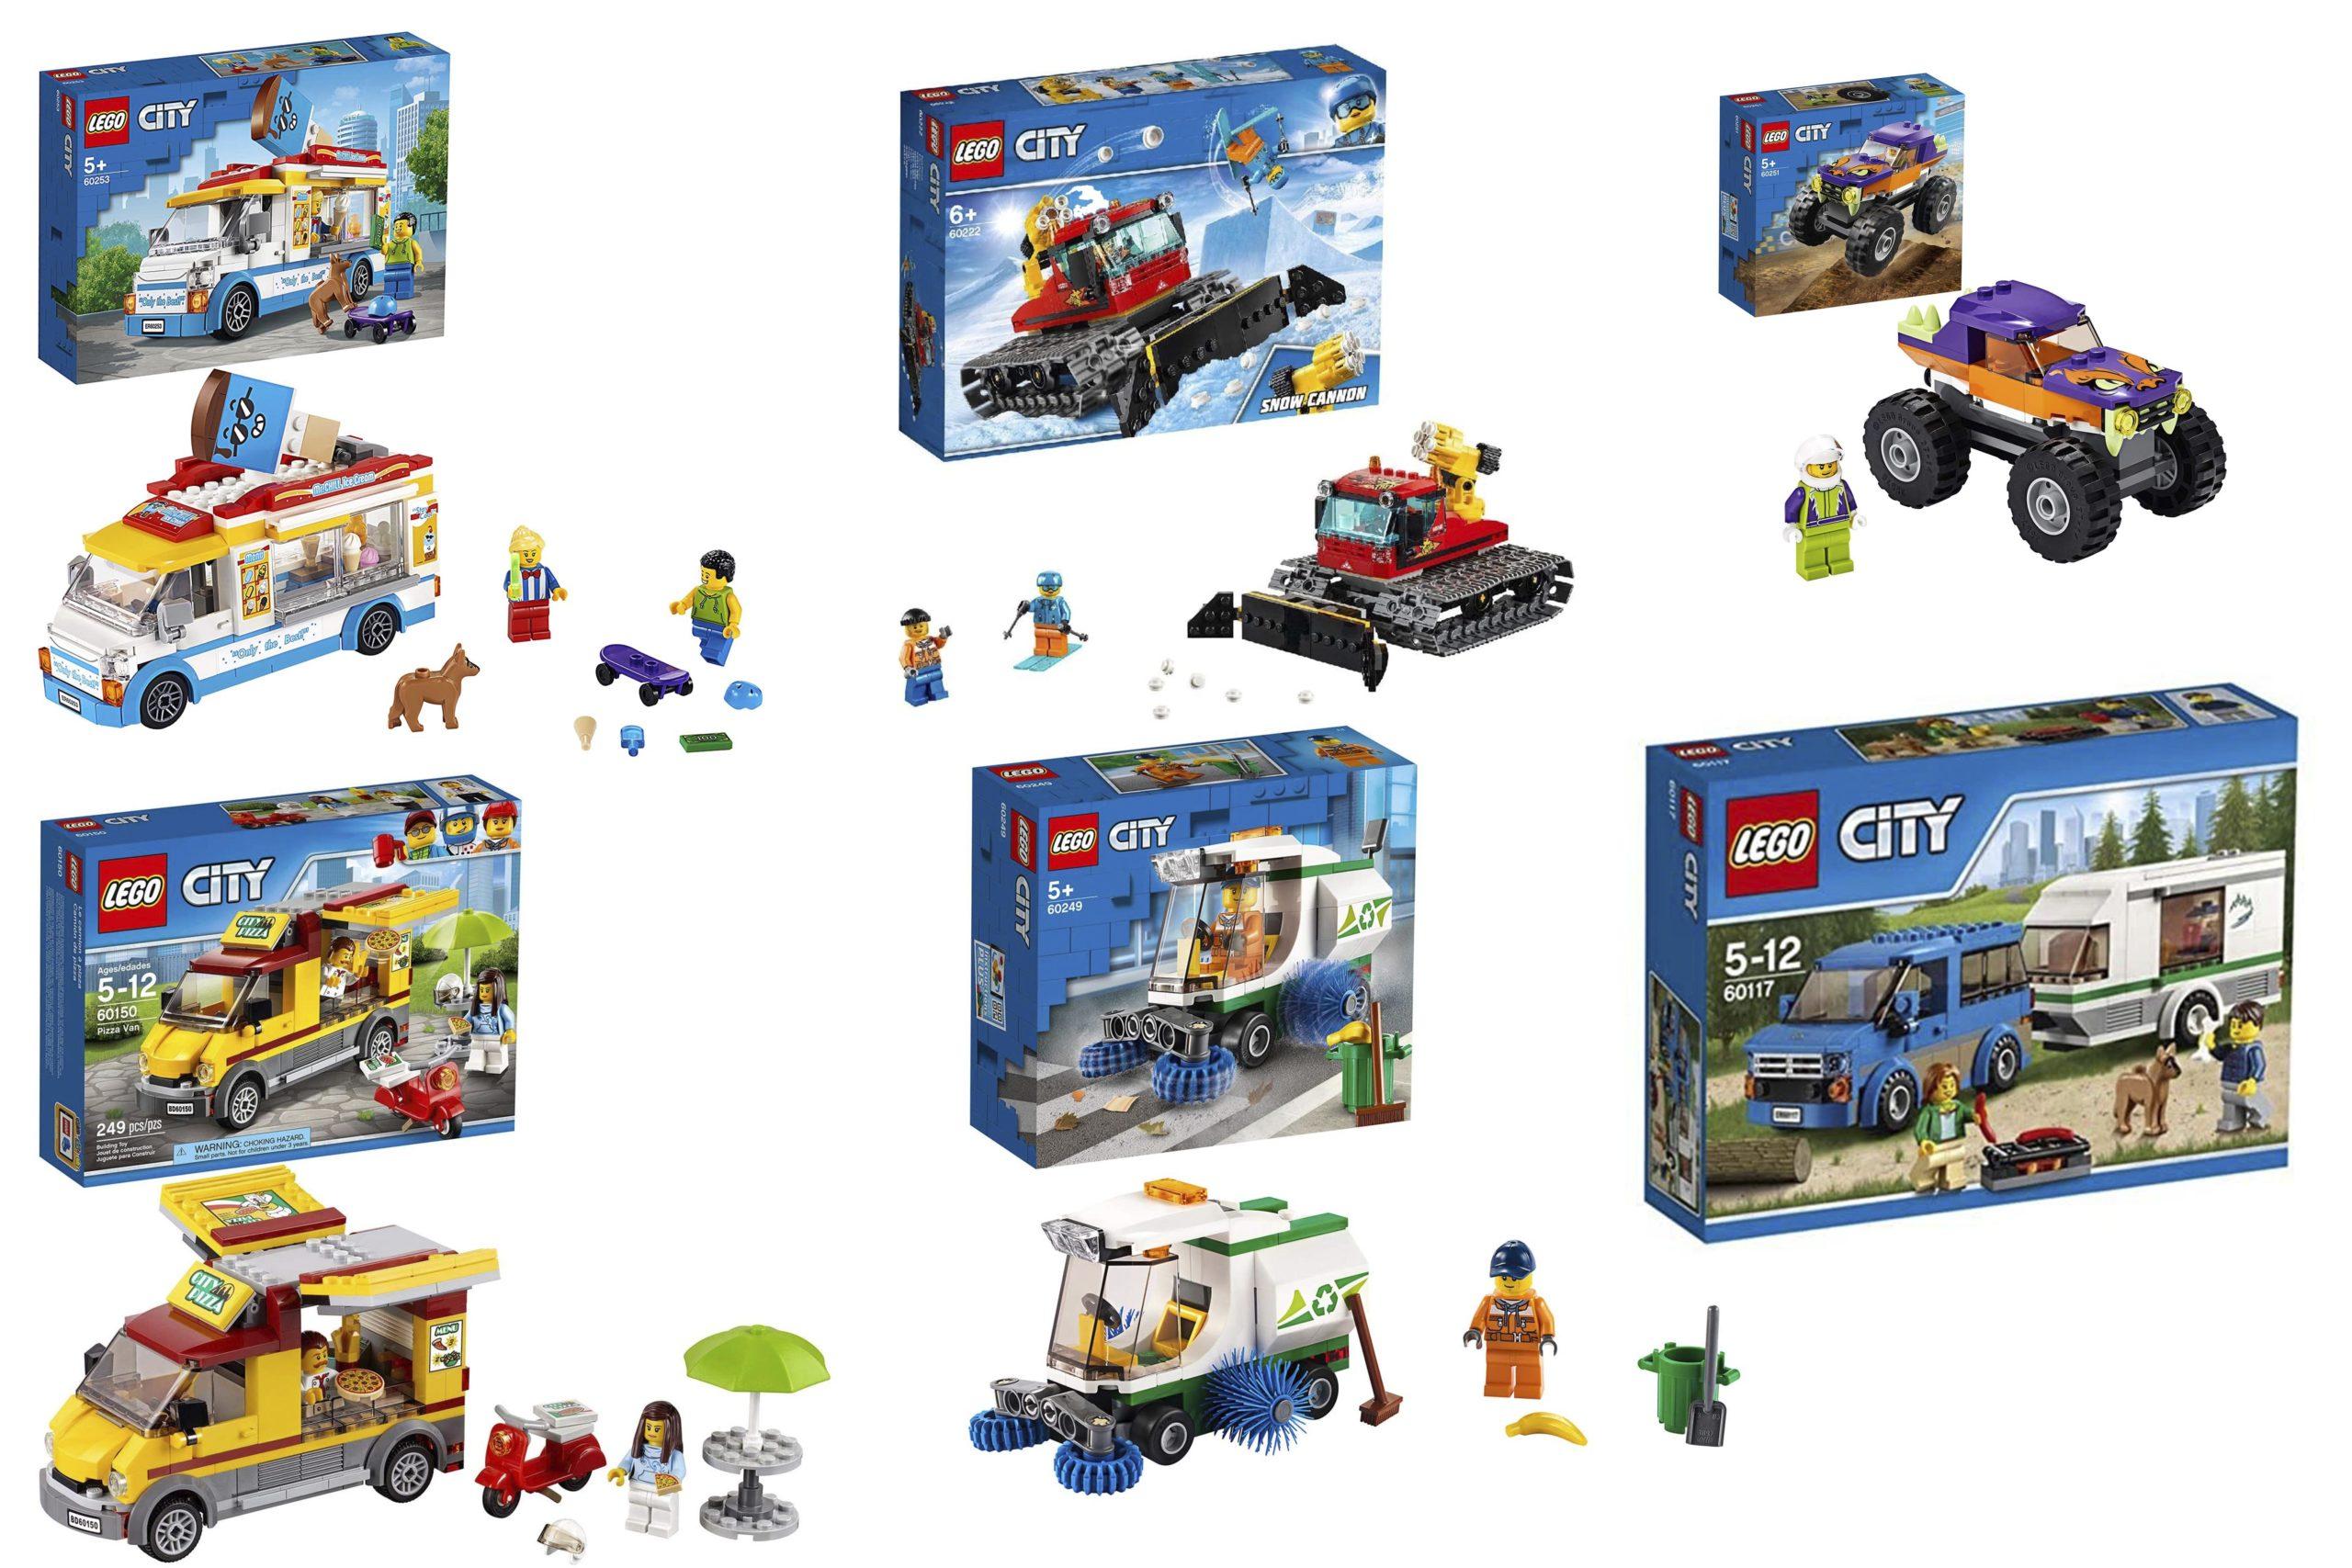 LEGO City Great Vehicles - Header Image